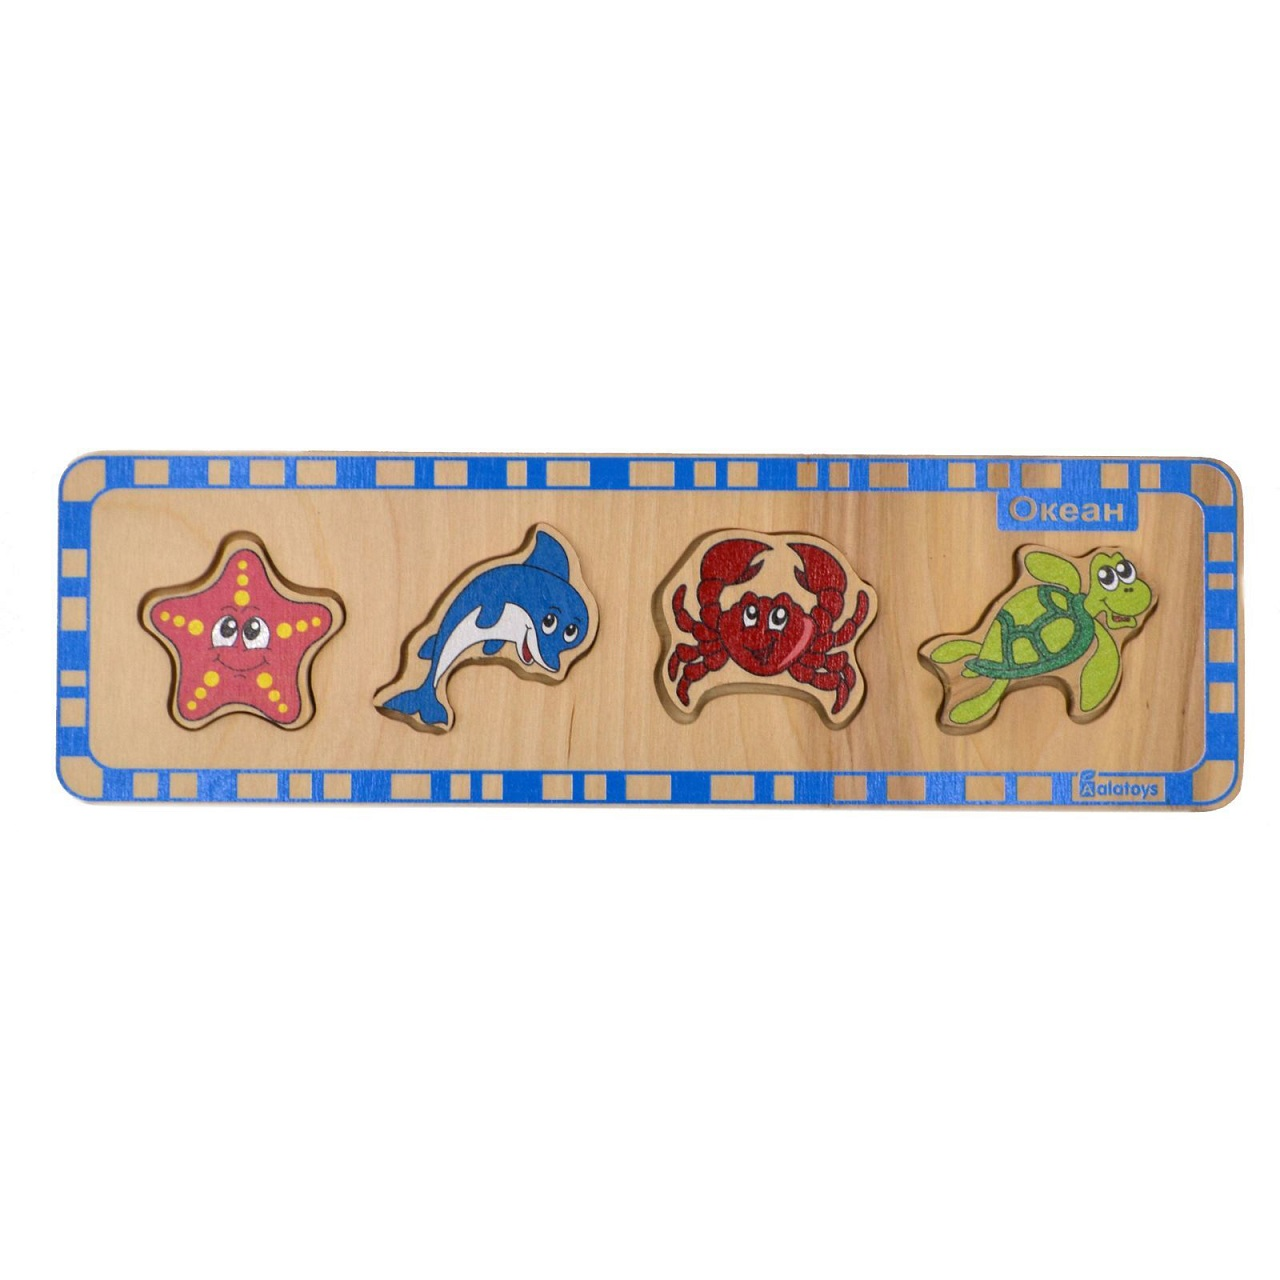 Пазл деревянный для малышей – ОкеанРамки и паззлы<br>Пазл деревянный для малышей – Океан<br>